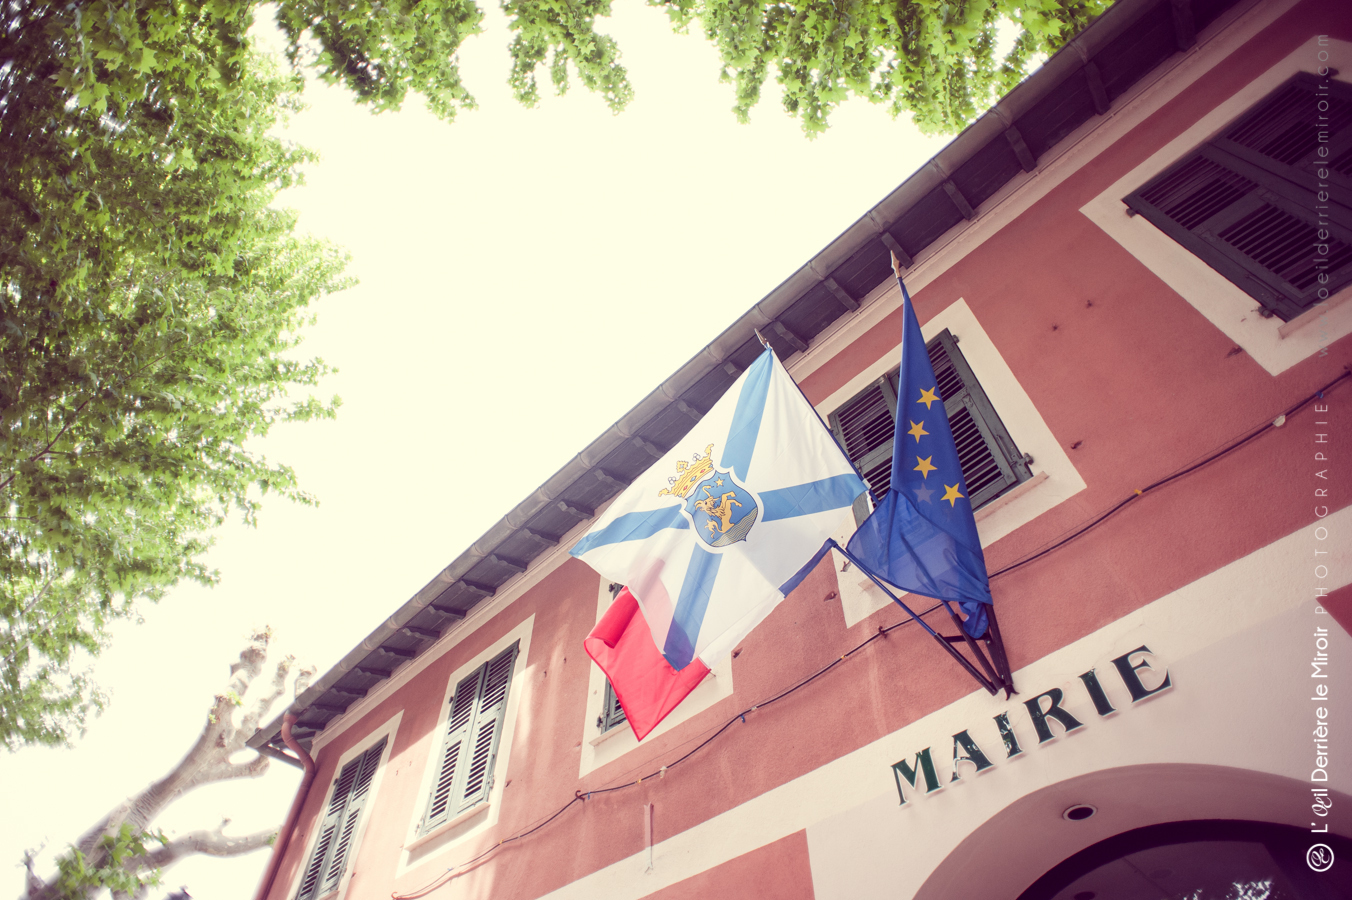 Mariage-LePark-loeilderrierelemiroir-045